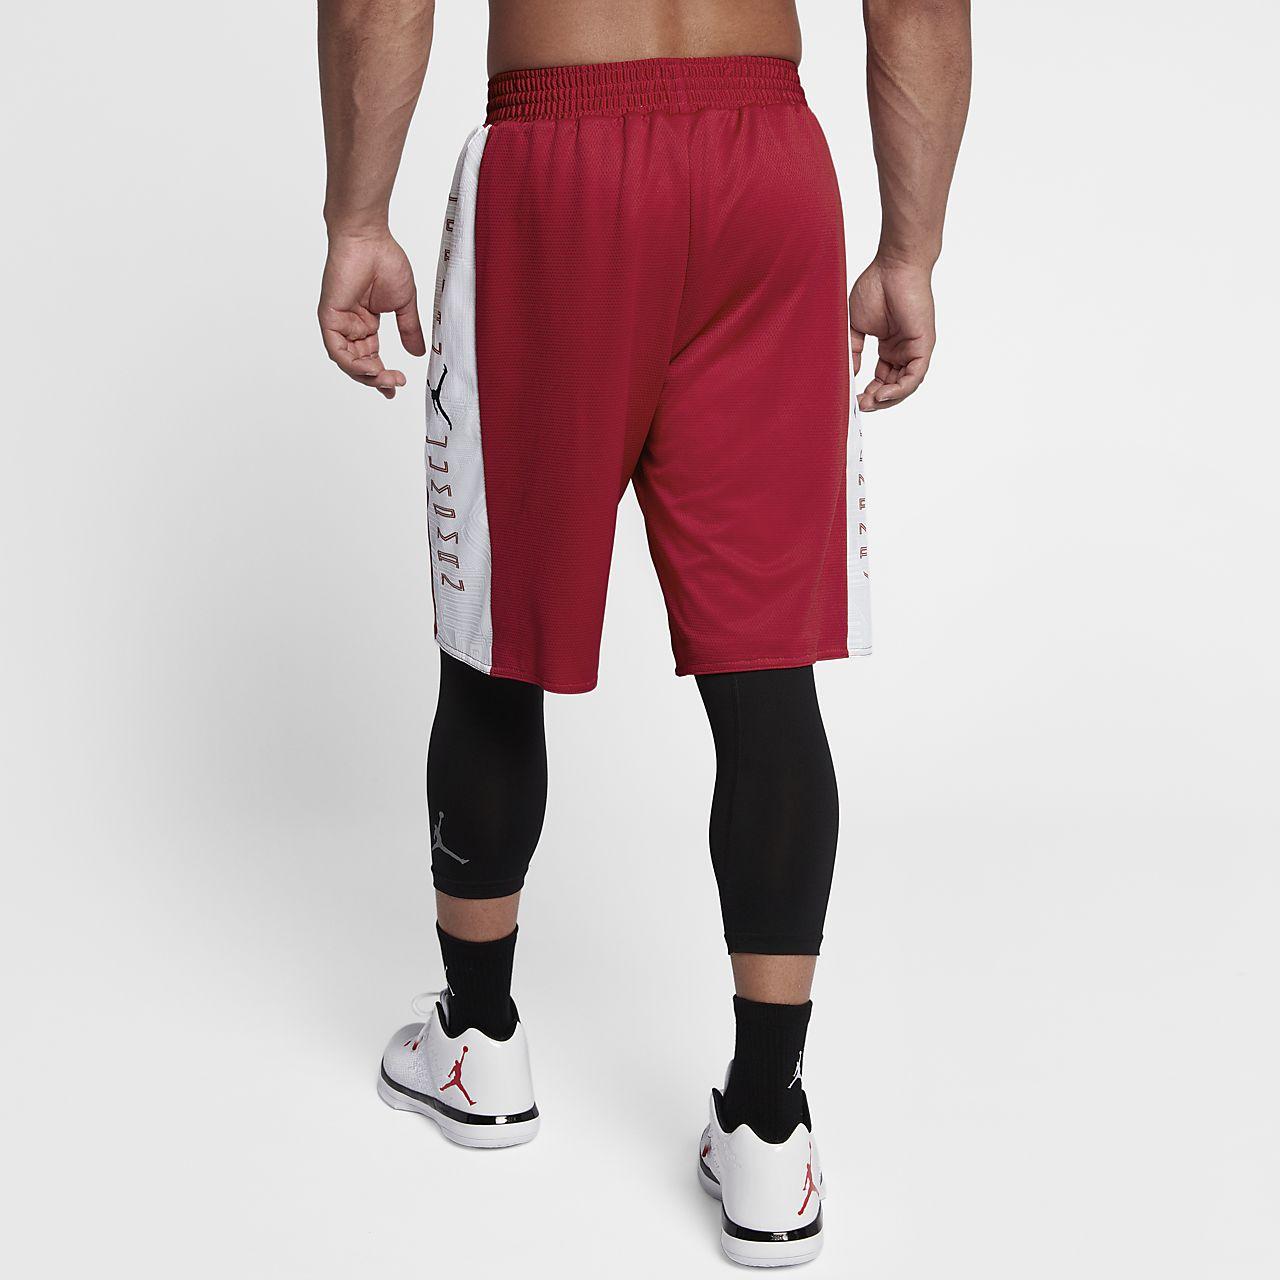 basketball shorts for mens